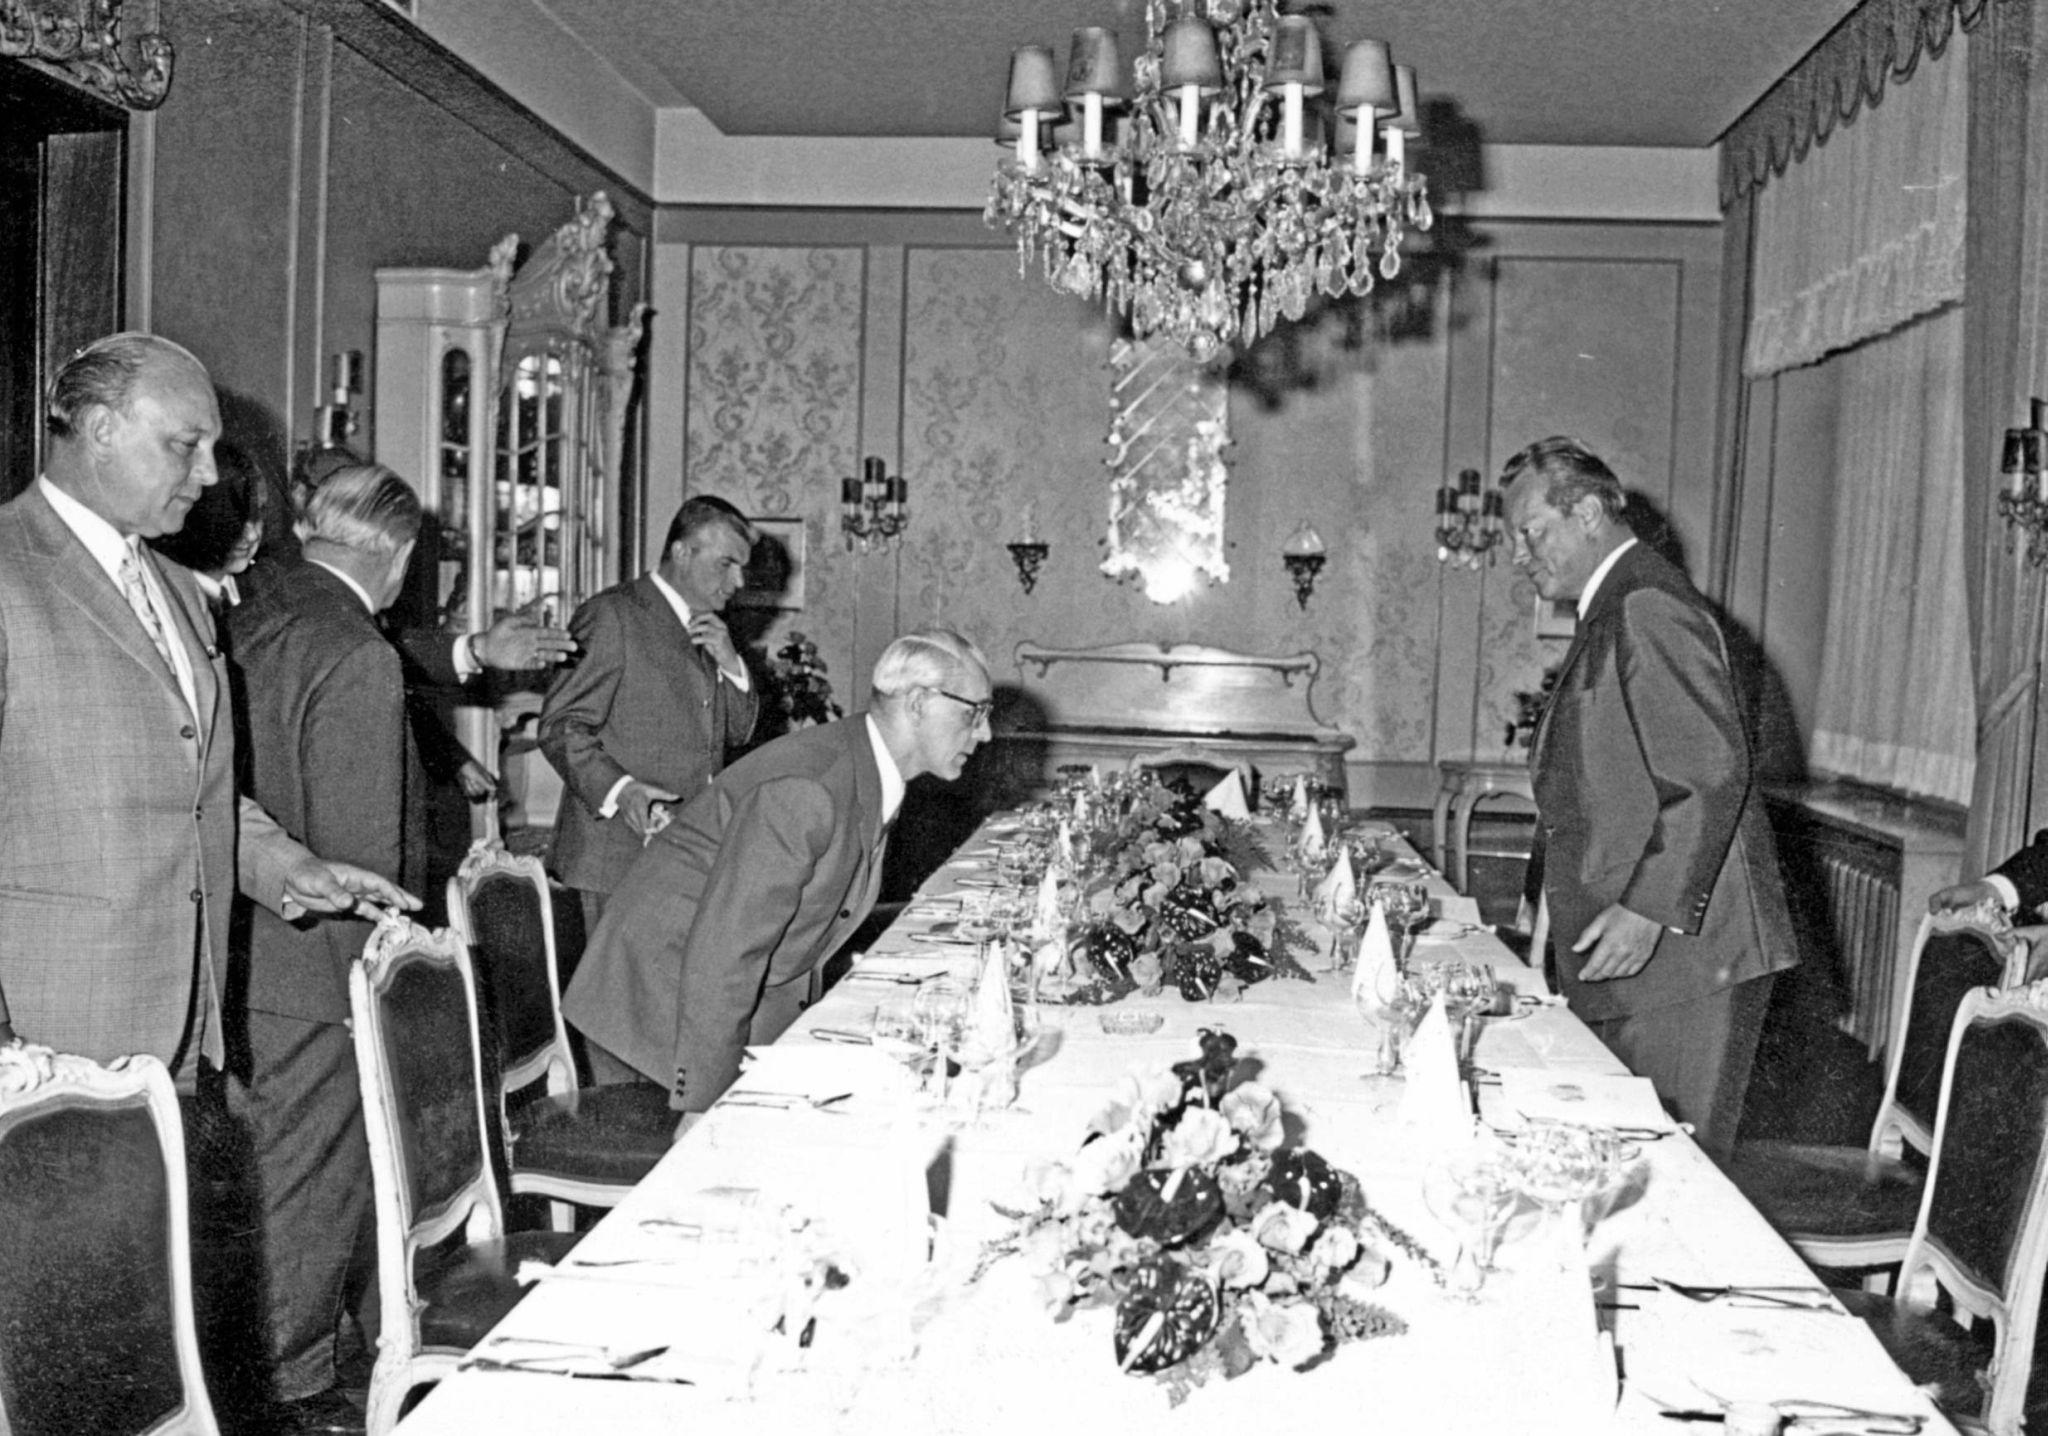 Willy Brandt és Willi Stoph Kasselben / Fotó: Hna.de